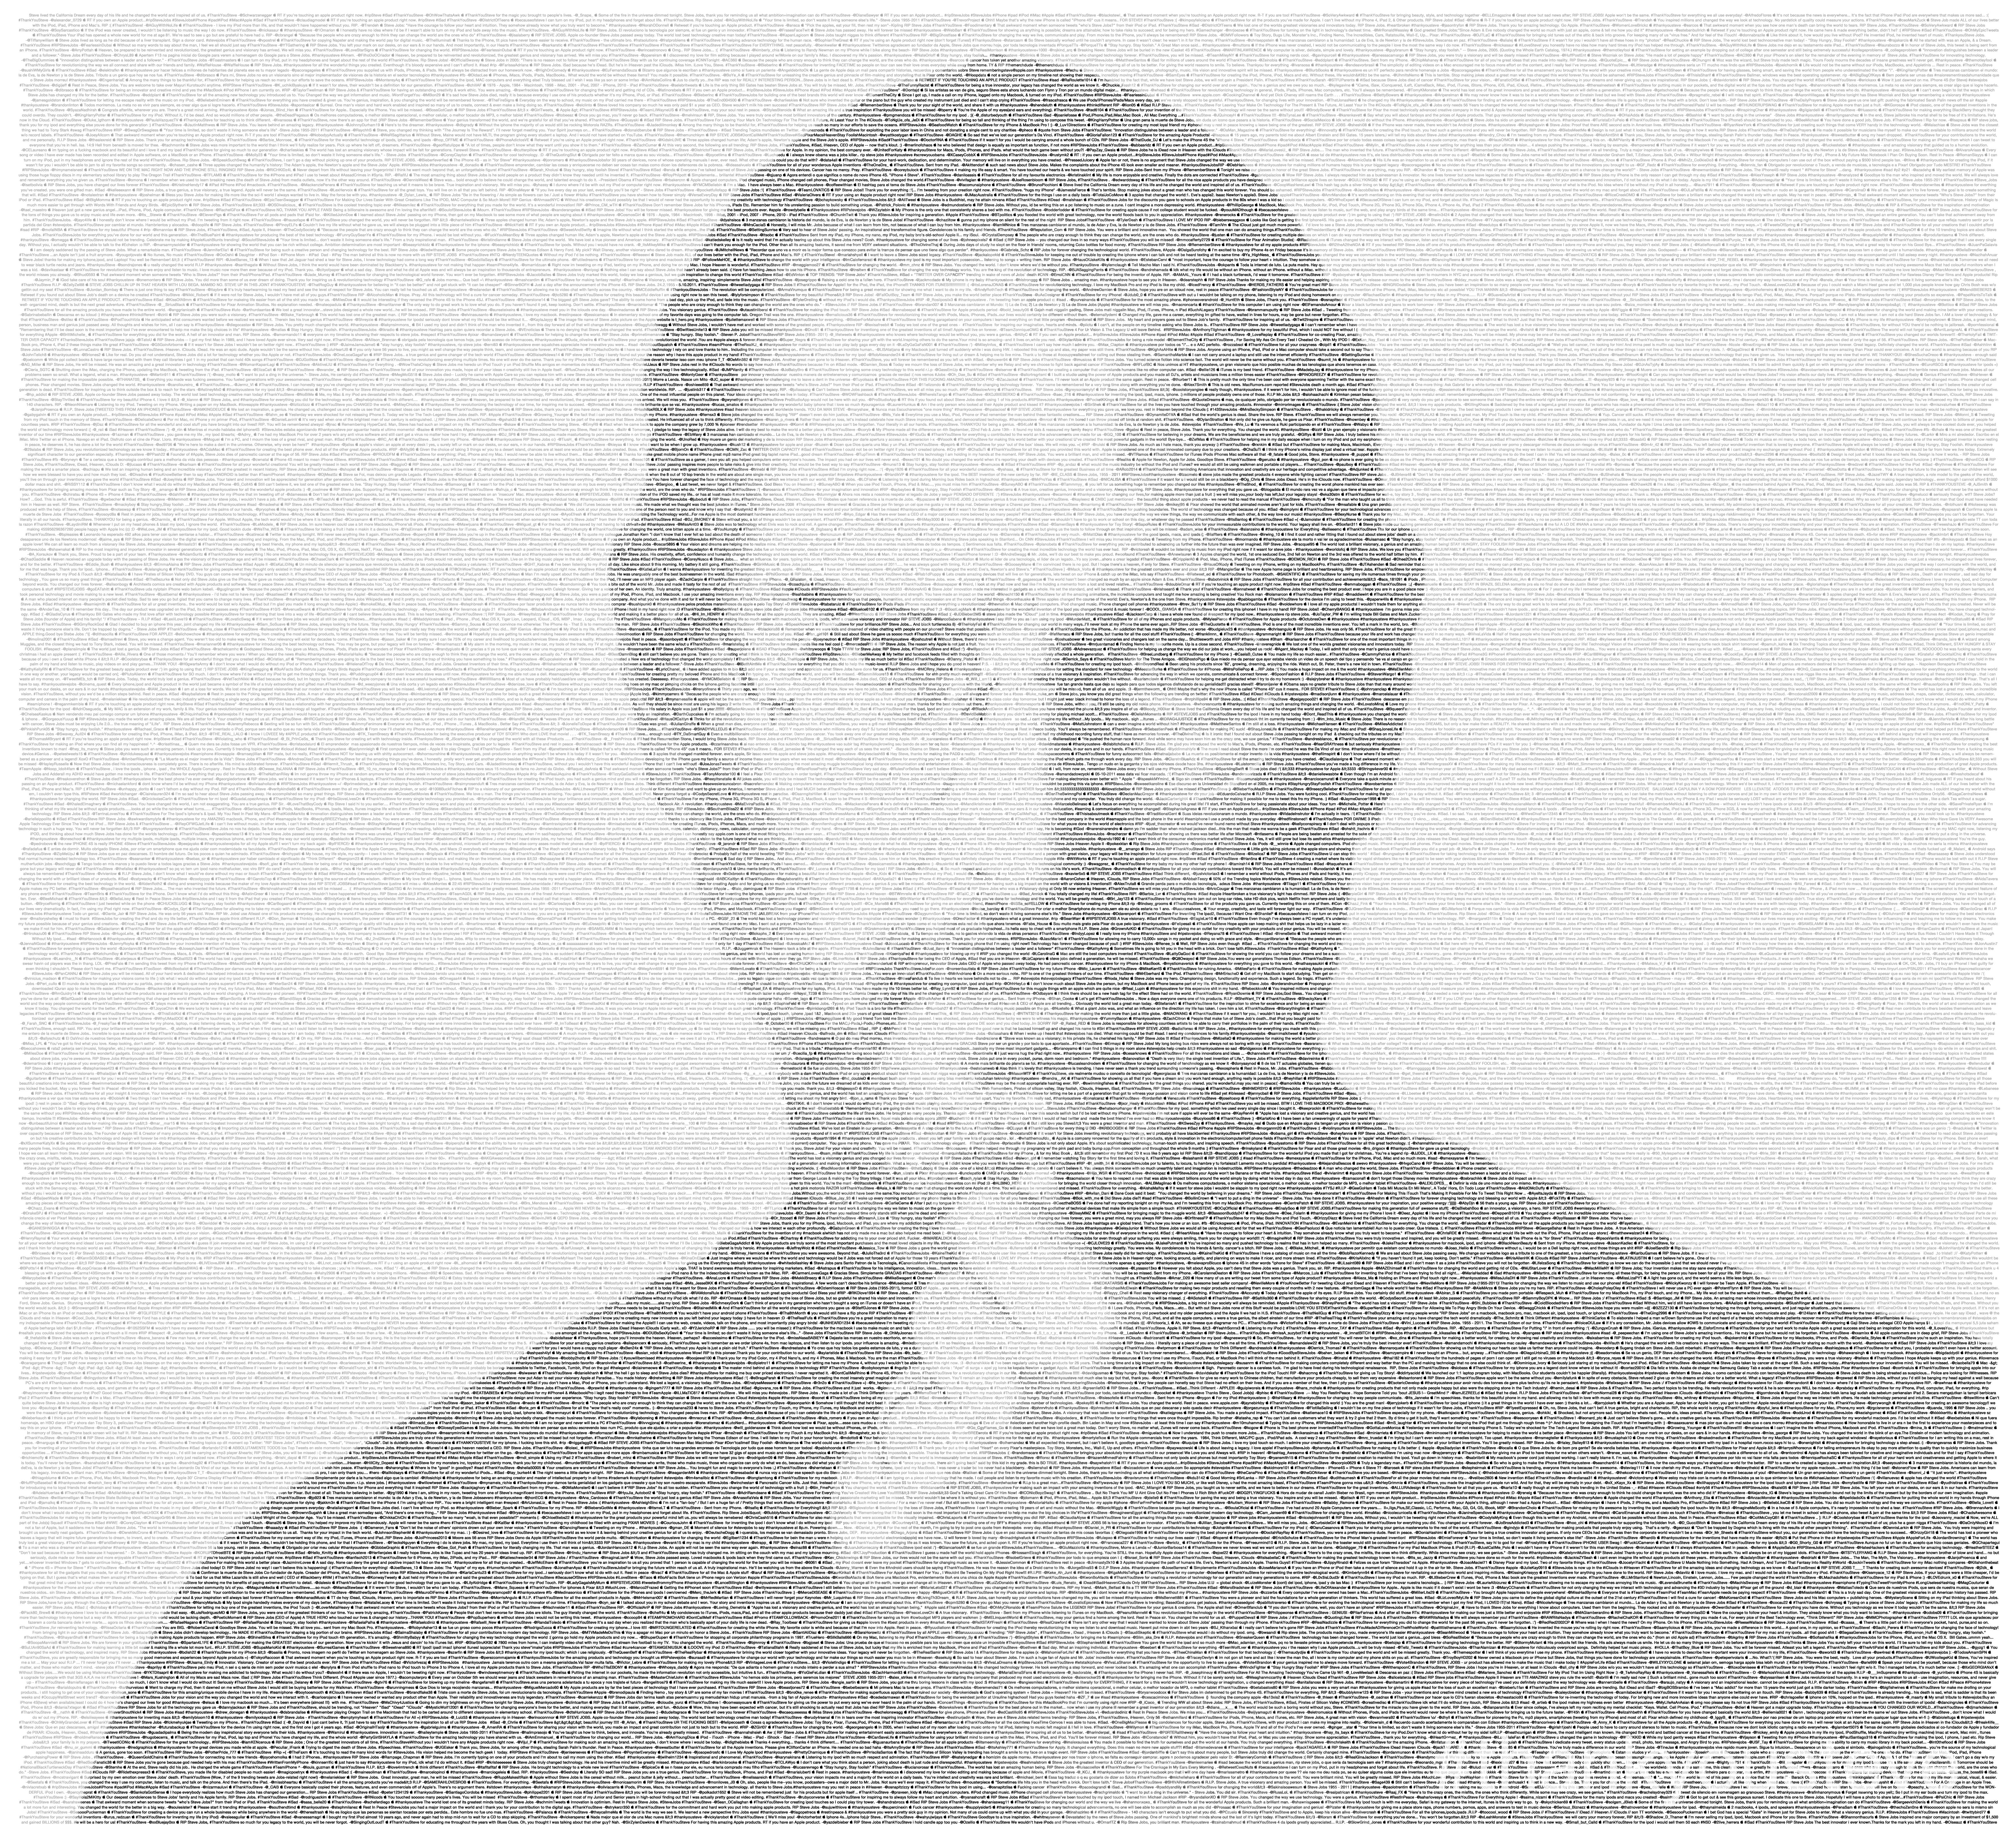 Imagen homenaje a Steve Jobs con mensajes de Twitter